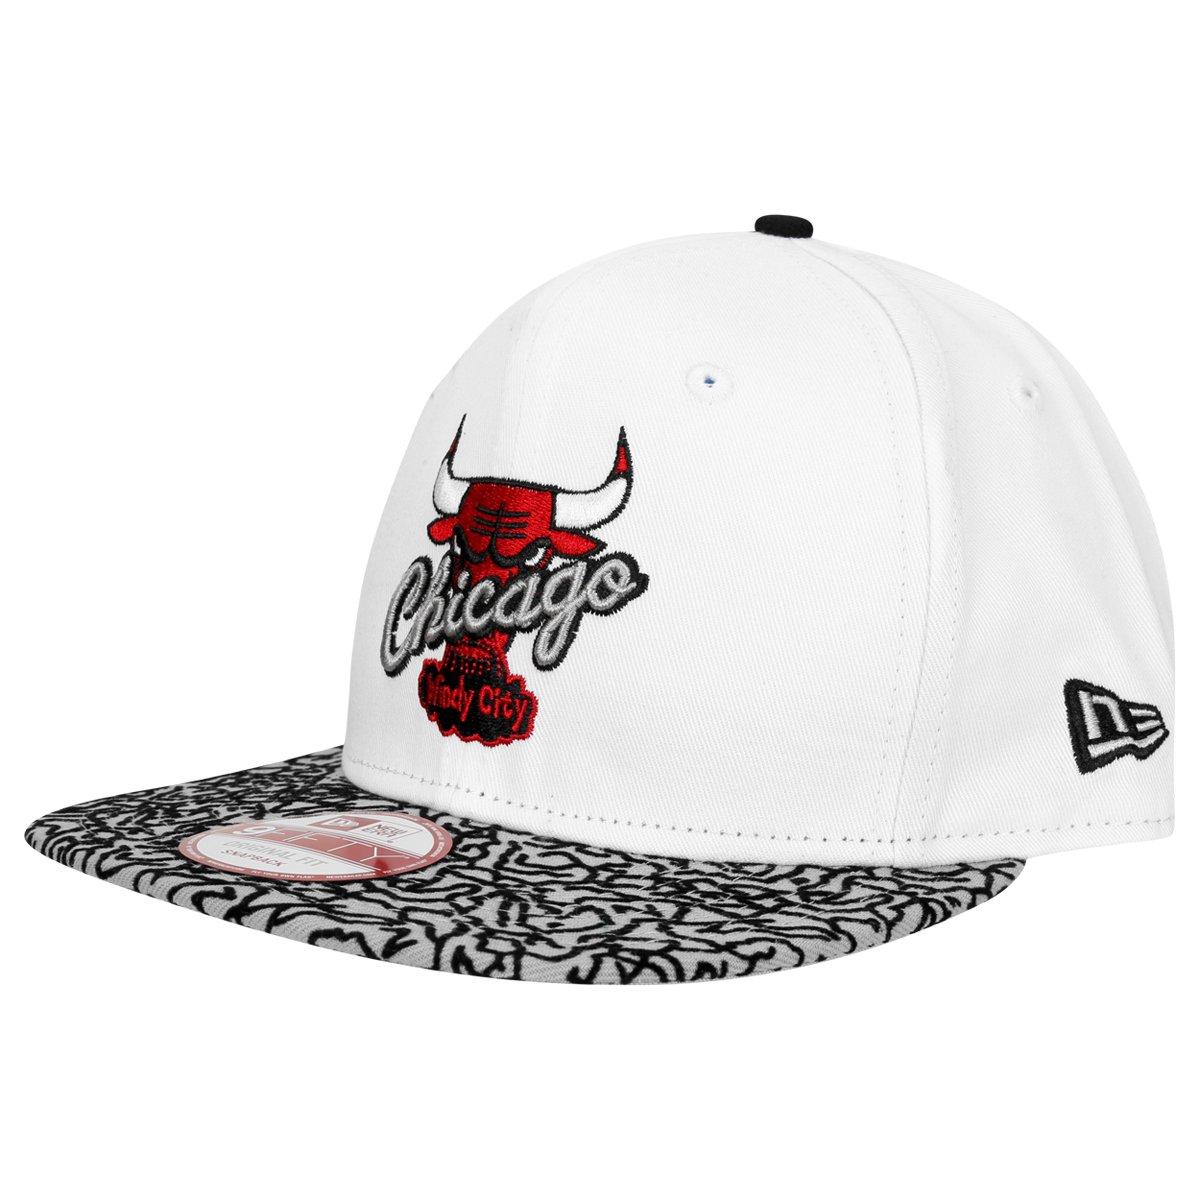 a2fb4d91635b8 Boné New Era NBA 950 Chicago Bulls - Compre Agora